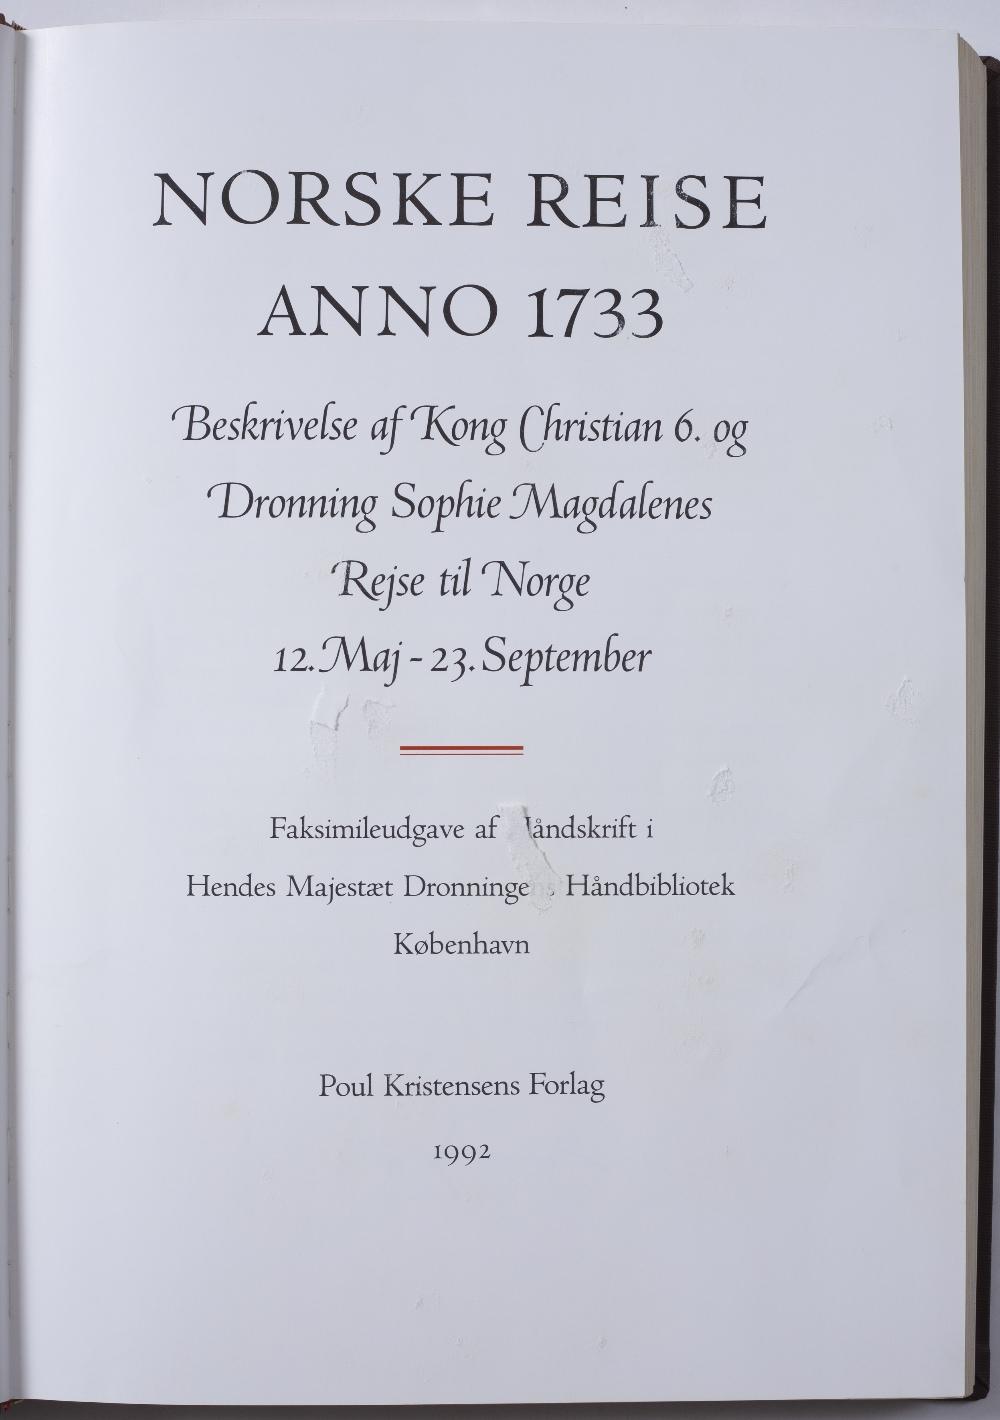 Norske Reise. Anno 1733. Facsimile. Poul Kristensens Forlag 1992. Fo in slip case. Some damp - Image 3 of 3